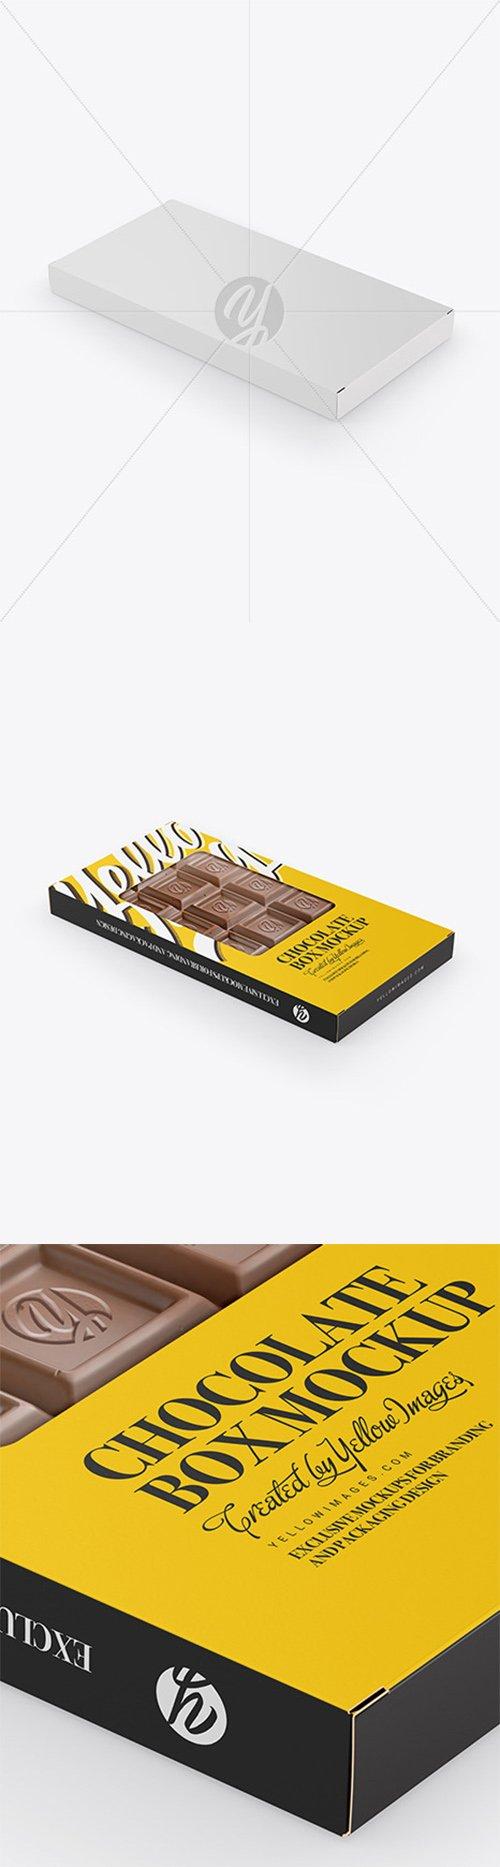 Glossy Chocolate Box W/ Window Mockup - Half Side View 55505 TIF